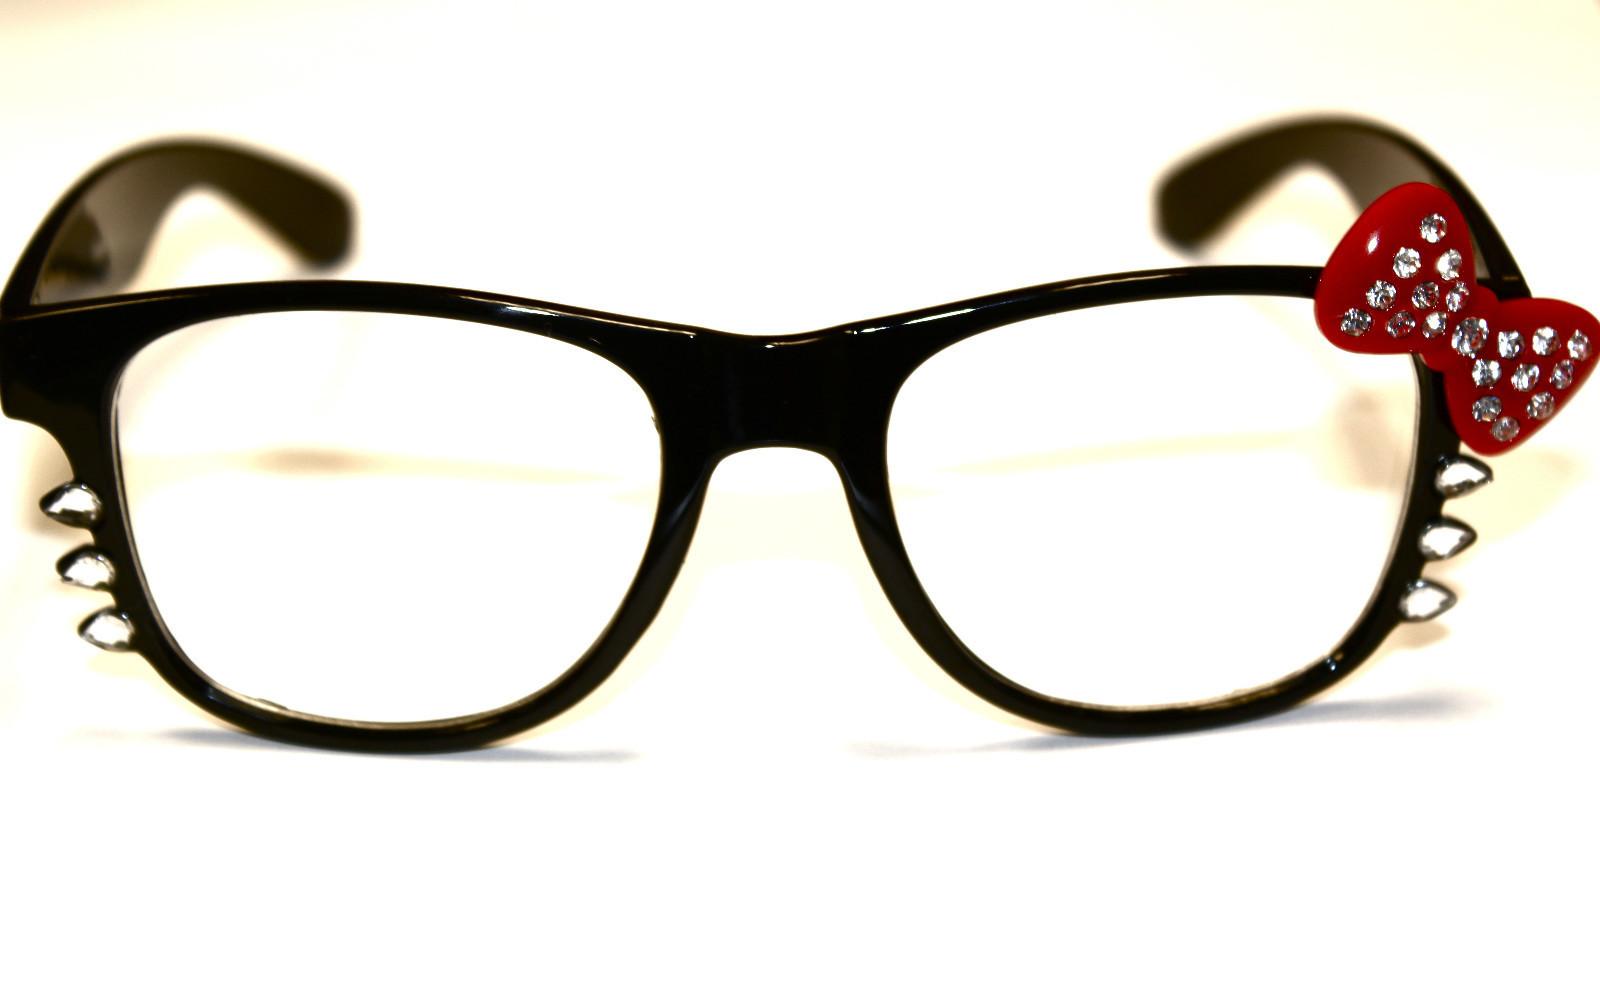 Geek eye glasses clipart